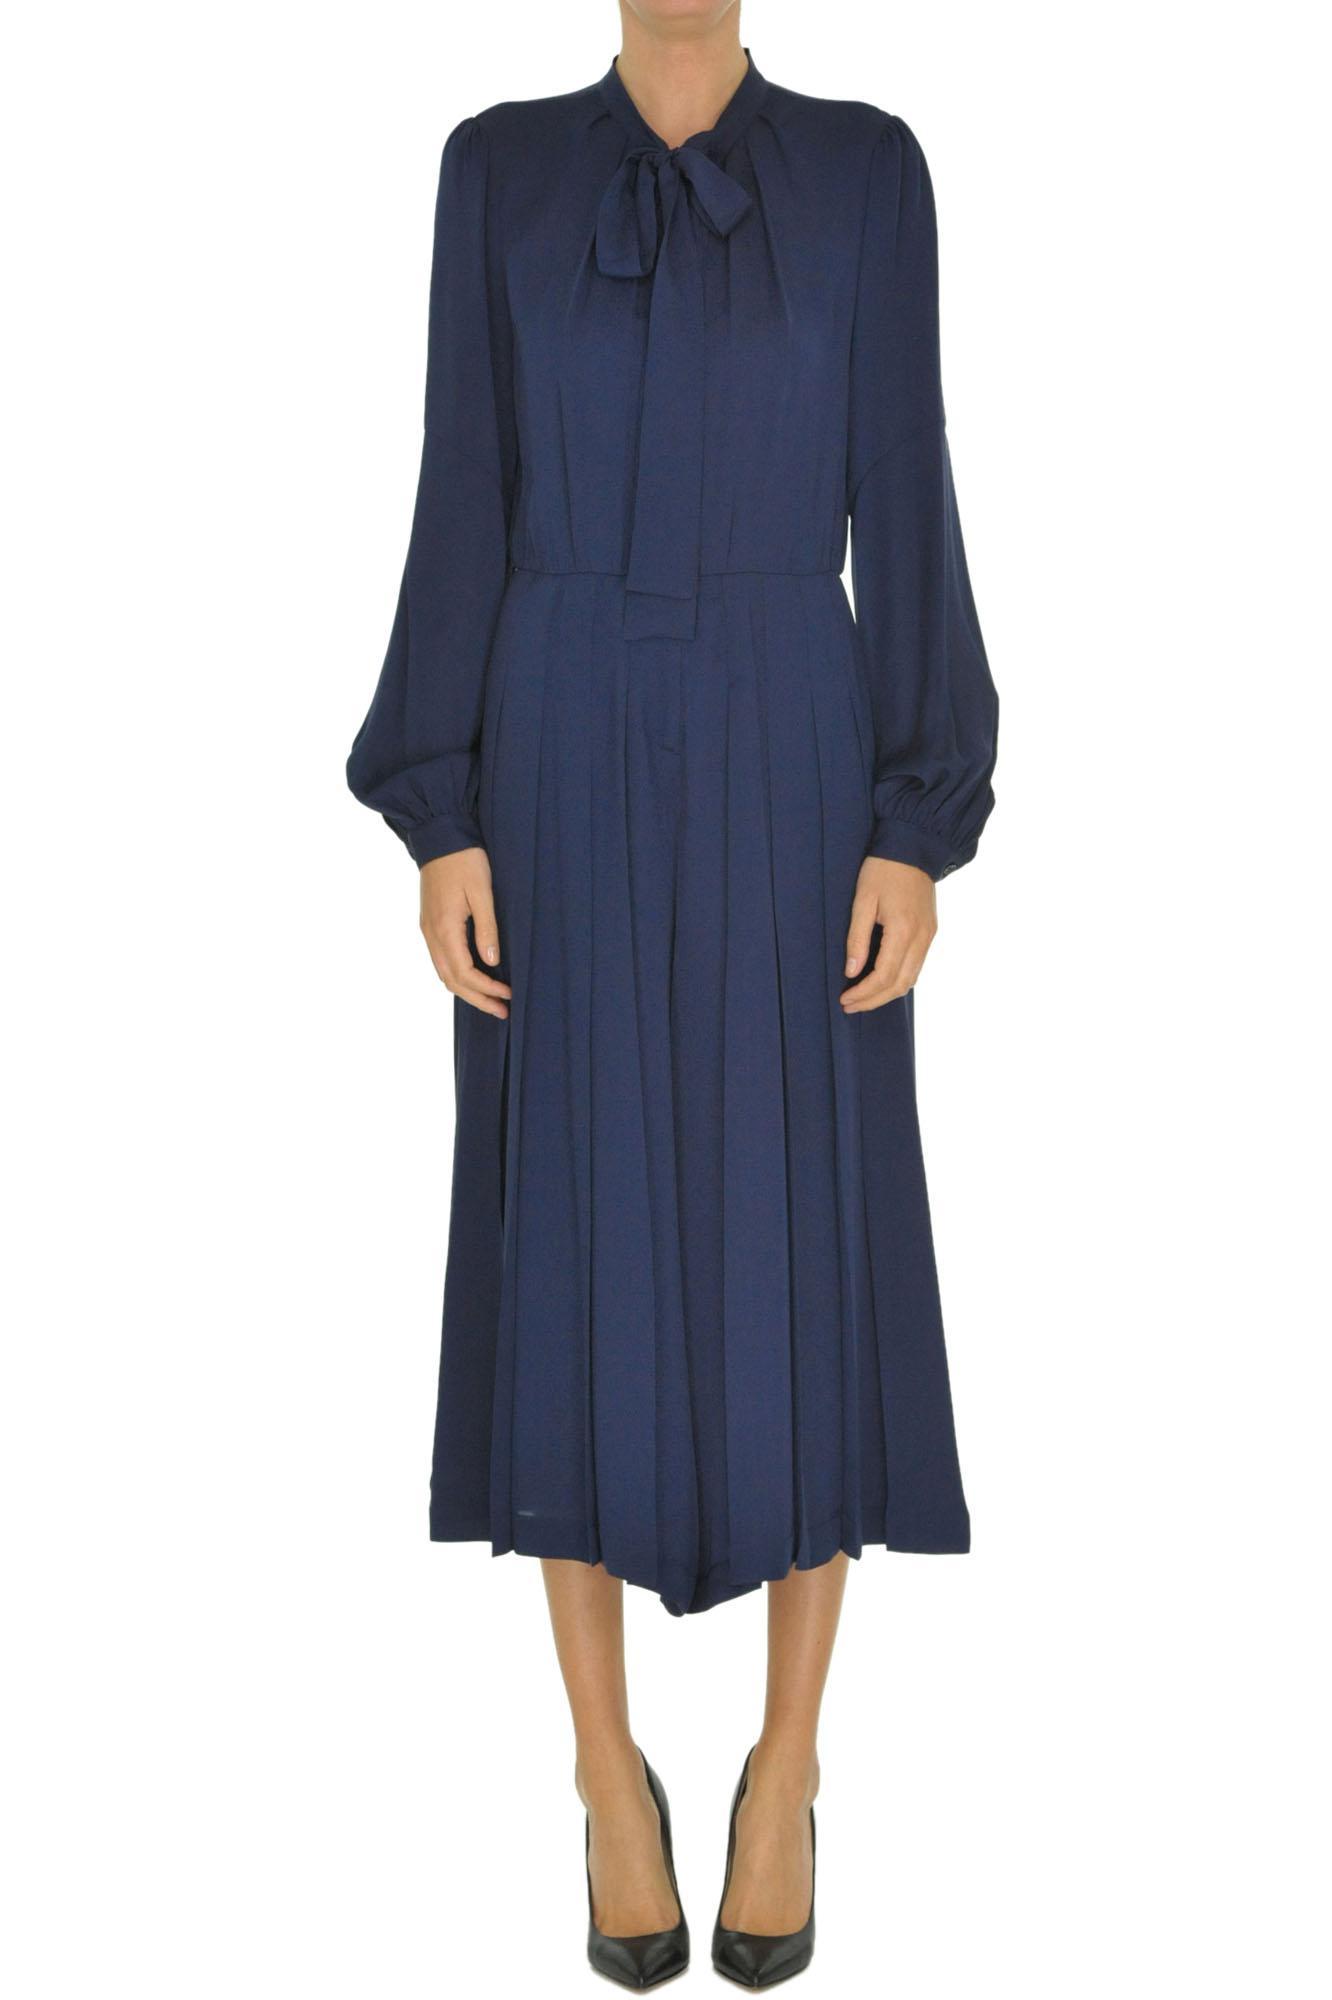 979879b0bcf9 Lyst - MICHAEL Michael Kors Crepè Silk Jumpsuit in Blue